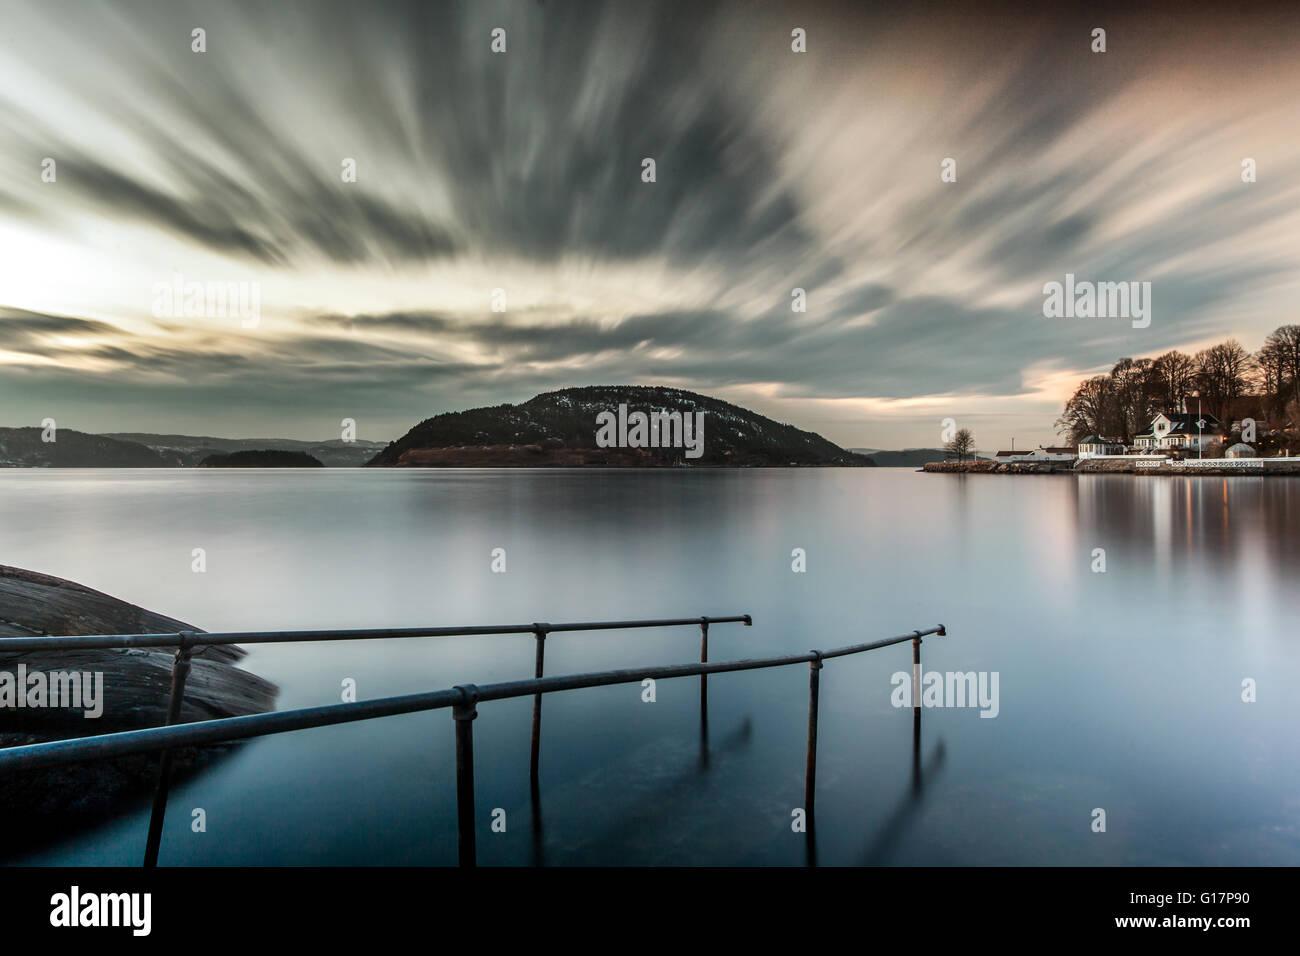 Railings submerged in water, Oscarsborg, Drobak, Norway - Stock Image